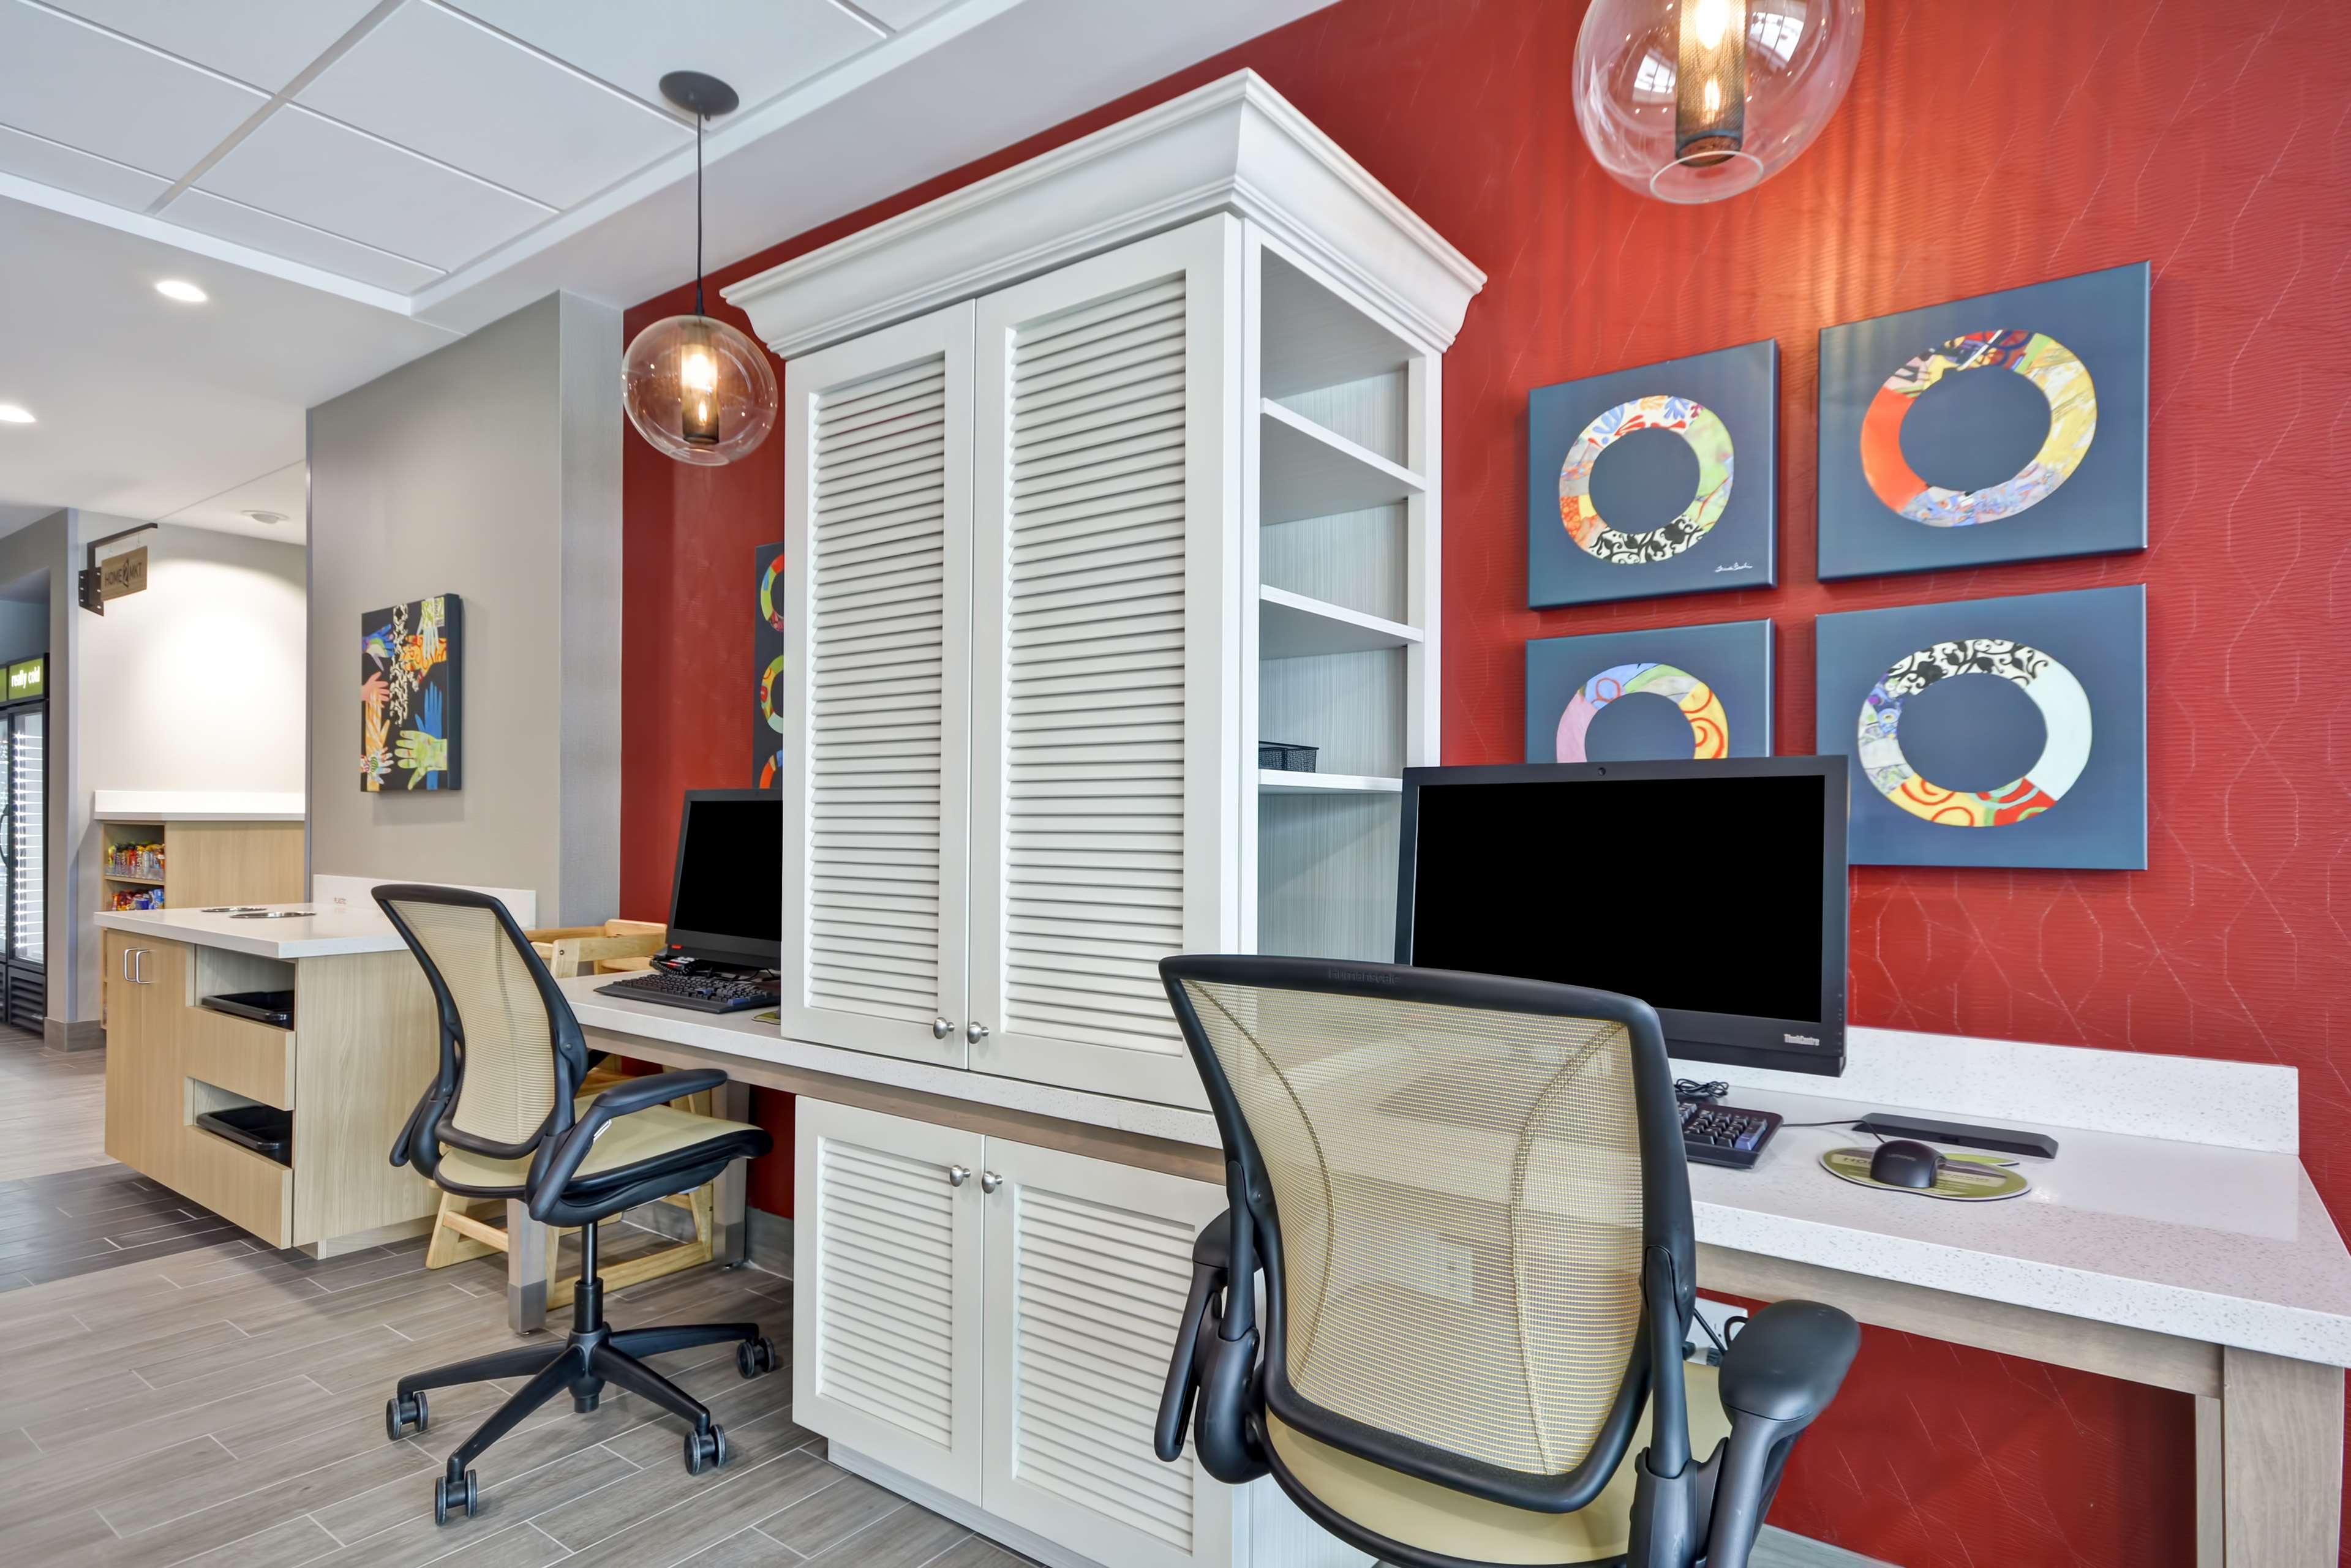 Home2 Suites by Hilton Jackson image 24